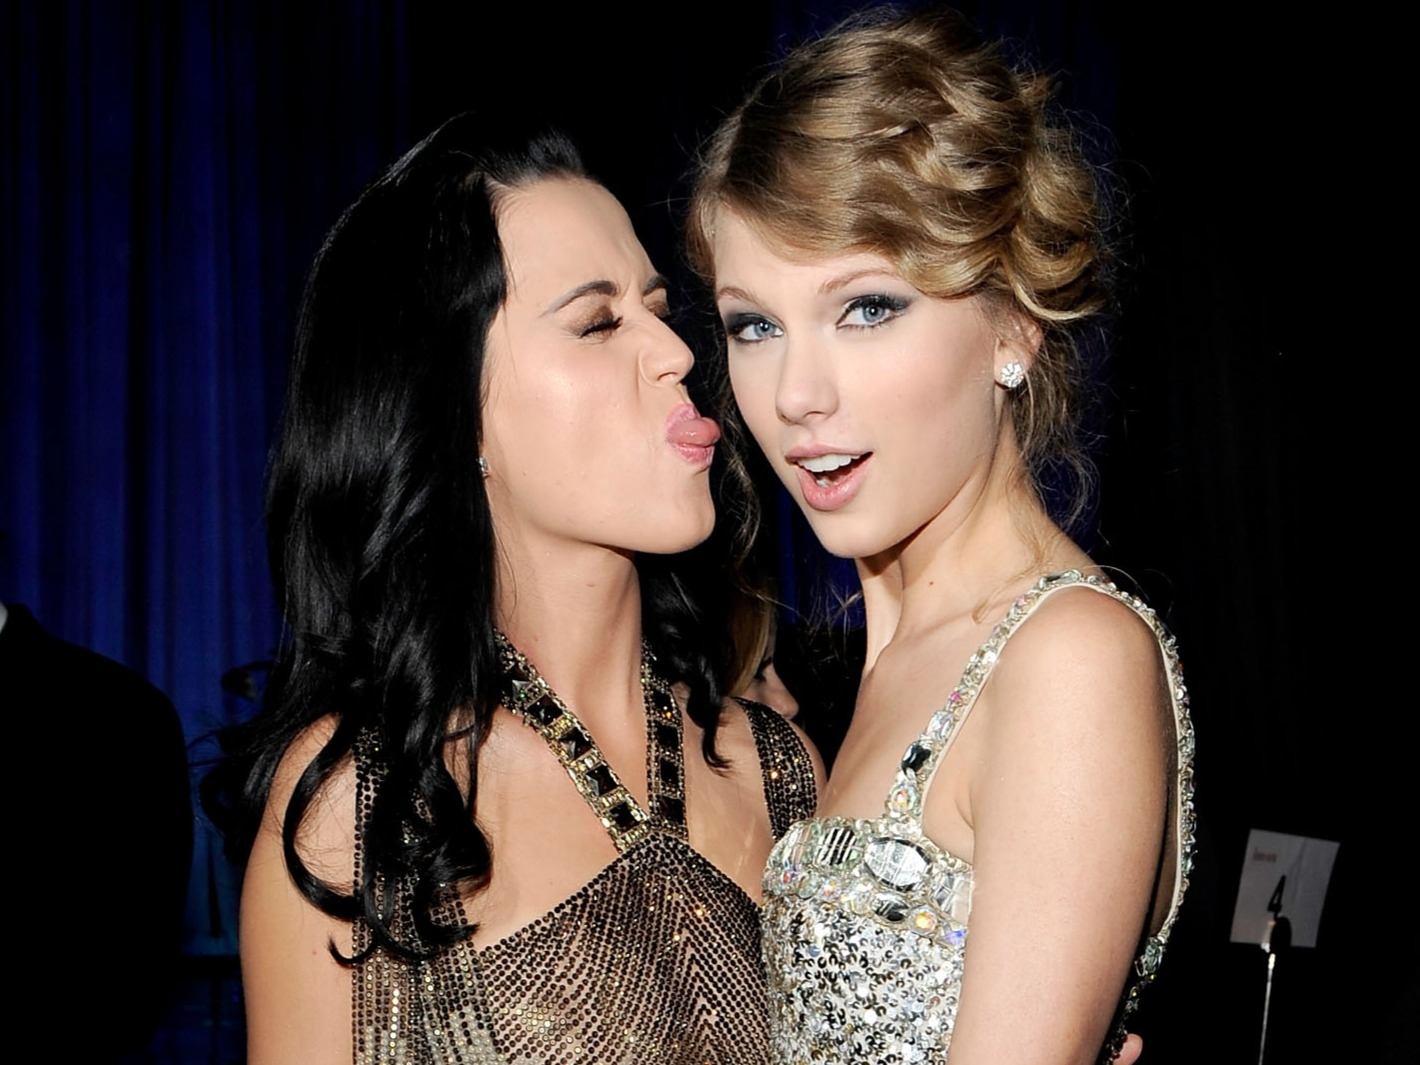 Katy, Gwen, Ariana #ShortBuzzz